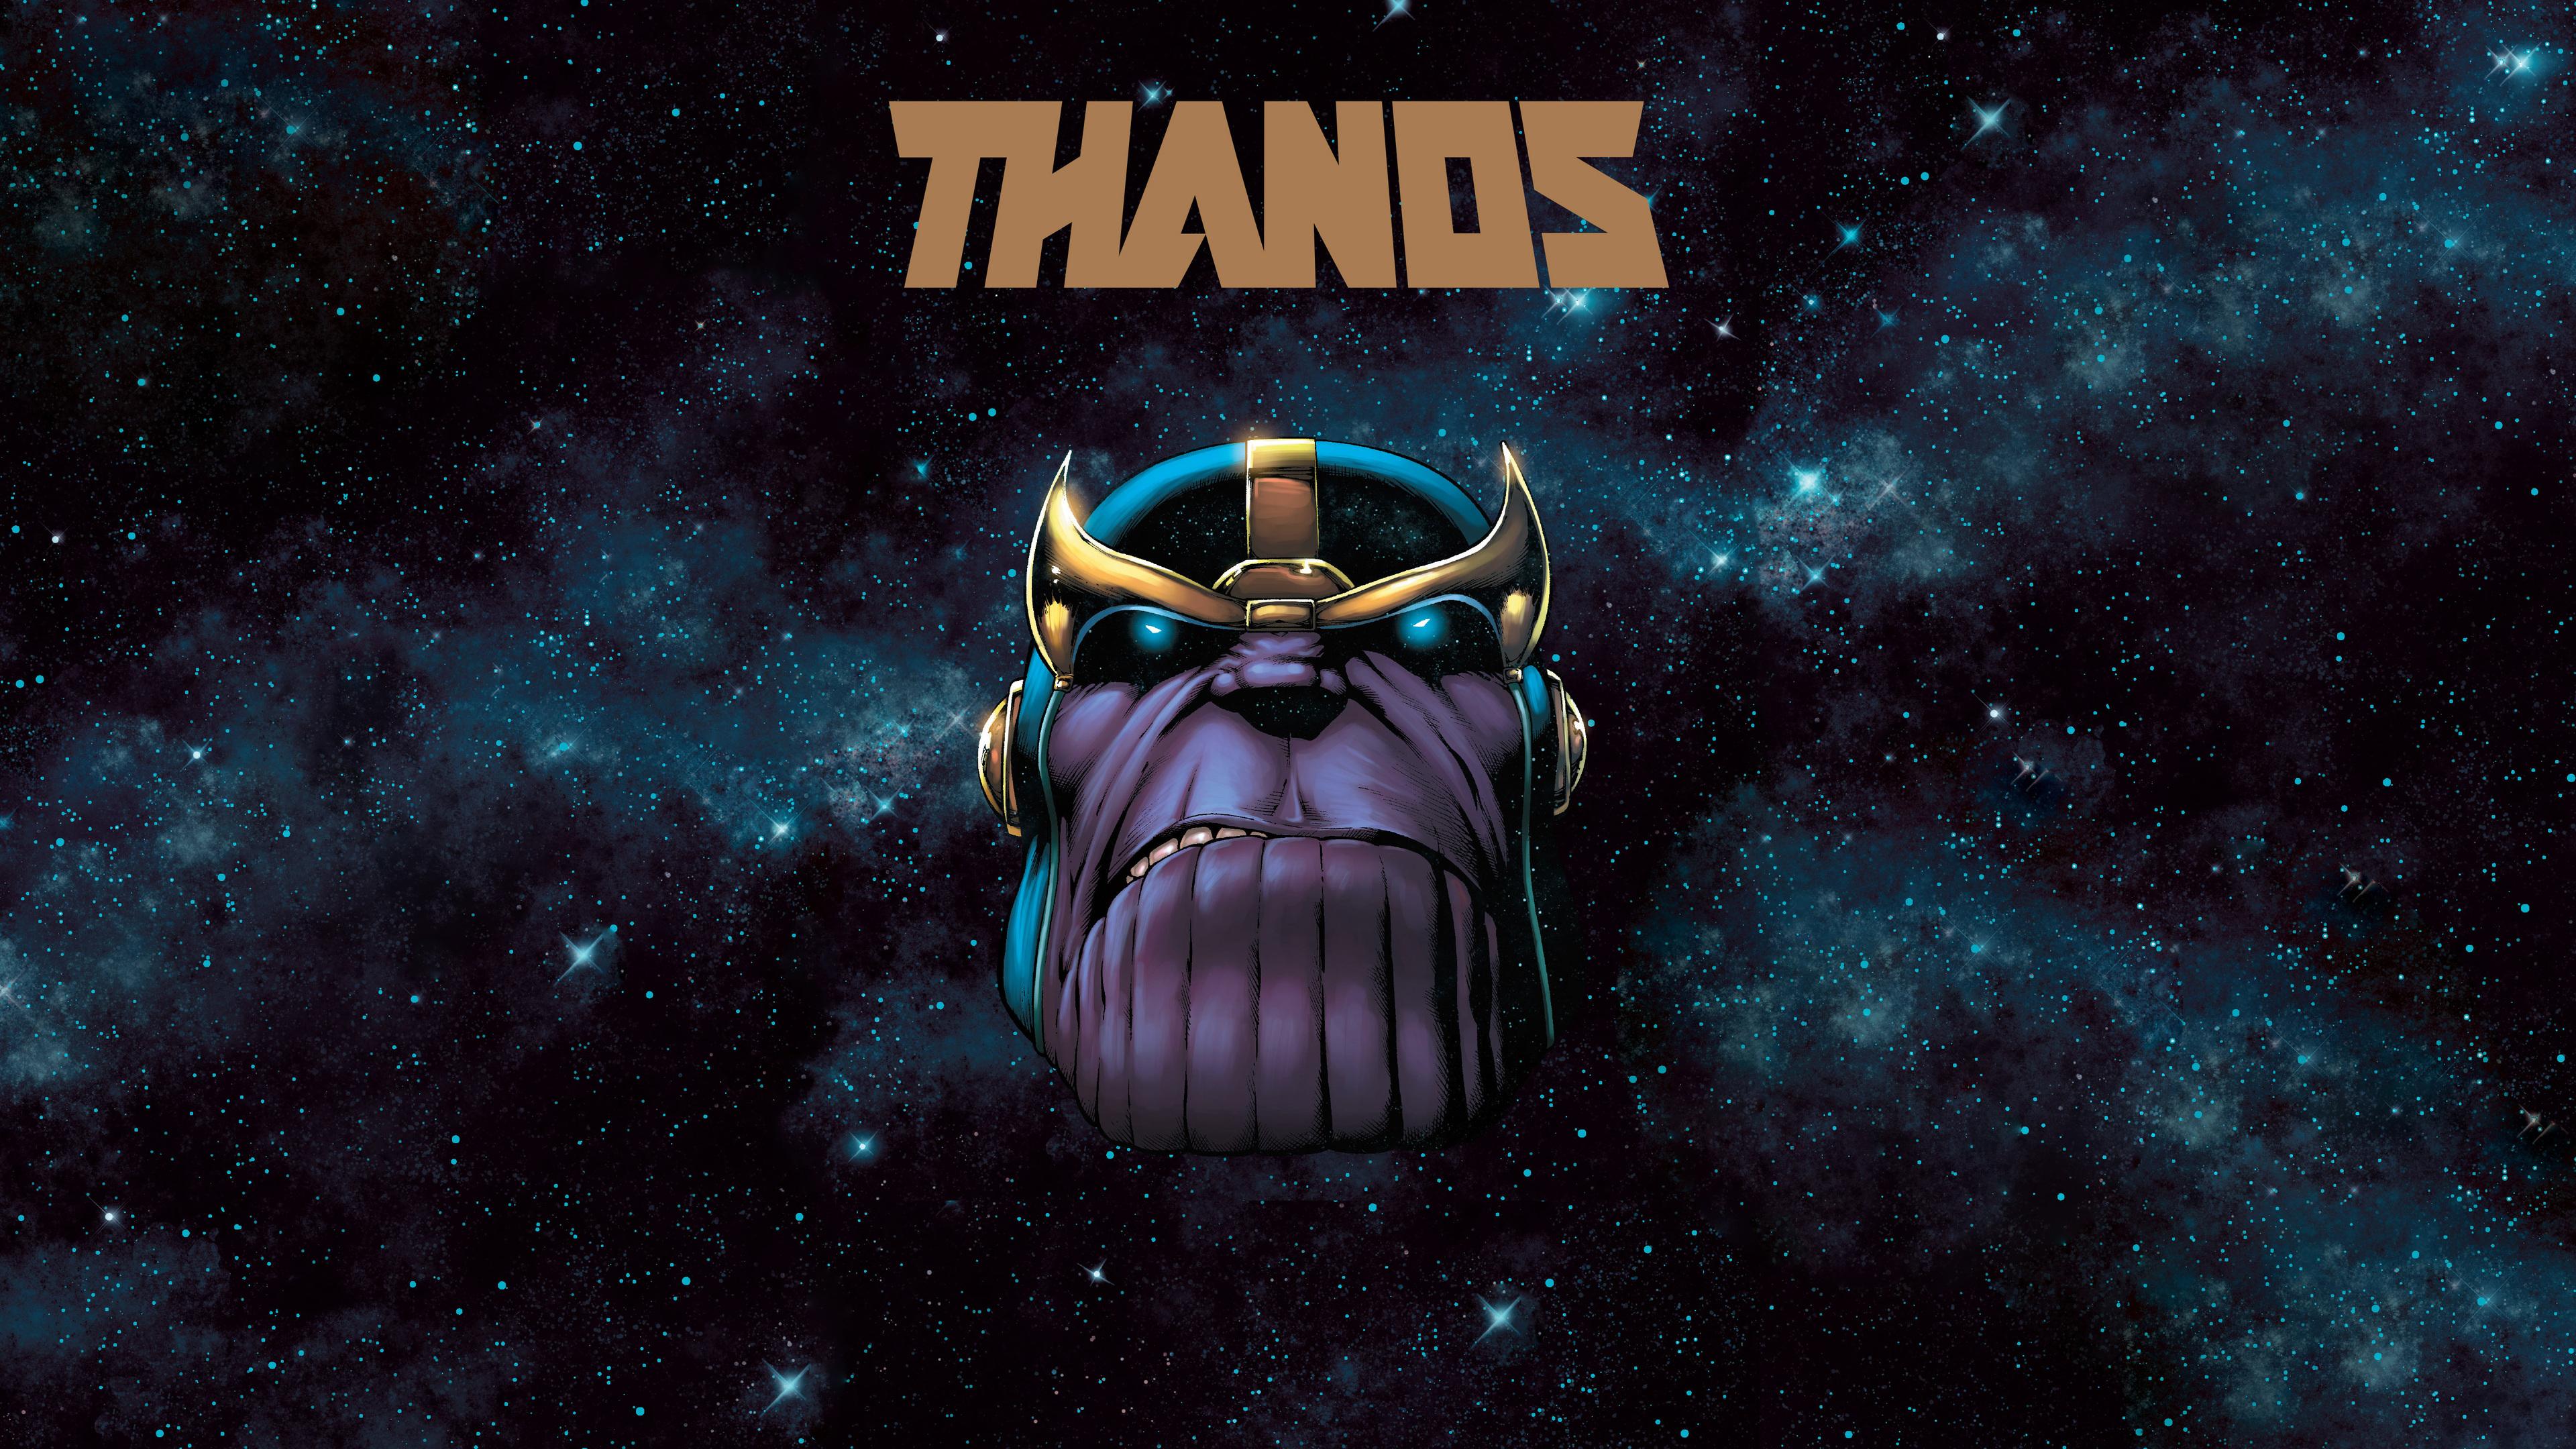 thanos 5k 1536518645 - Thanos 5k - thanos-wallpapers, thanos wallpaper 4k, marvel wallpapers, hd-wallpapers, deviantart wallpapers, 5k wallpapers, 4k-wallpapers